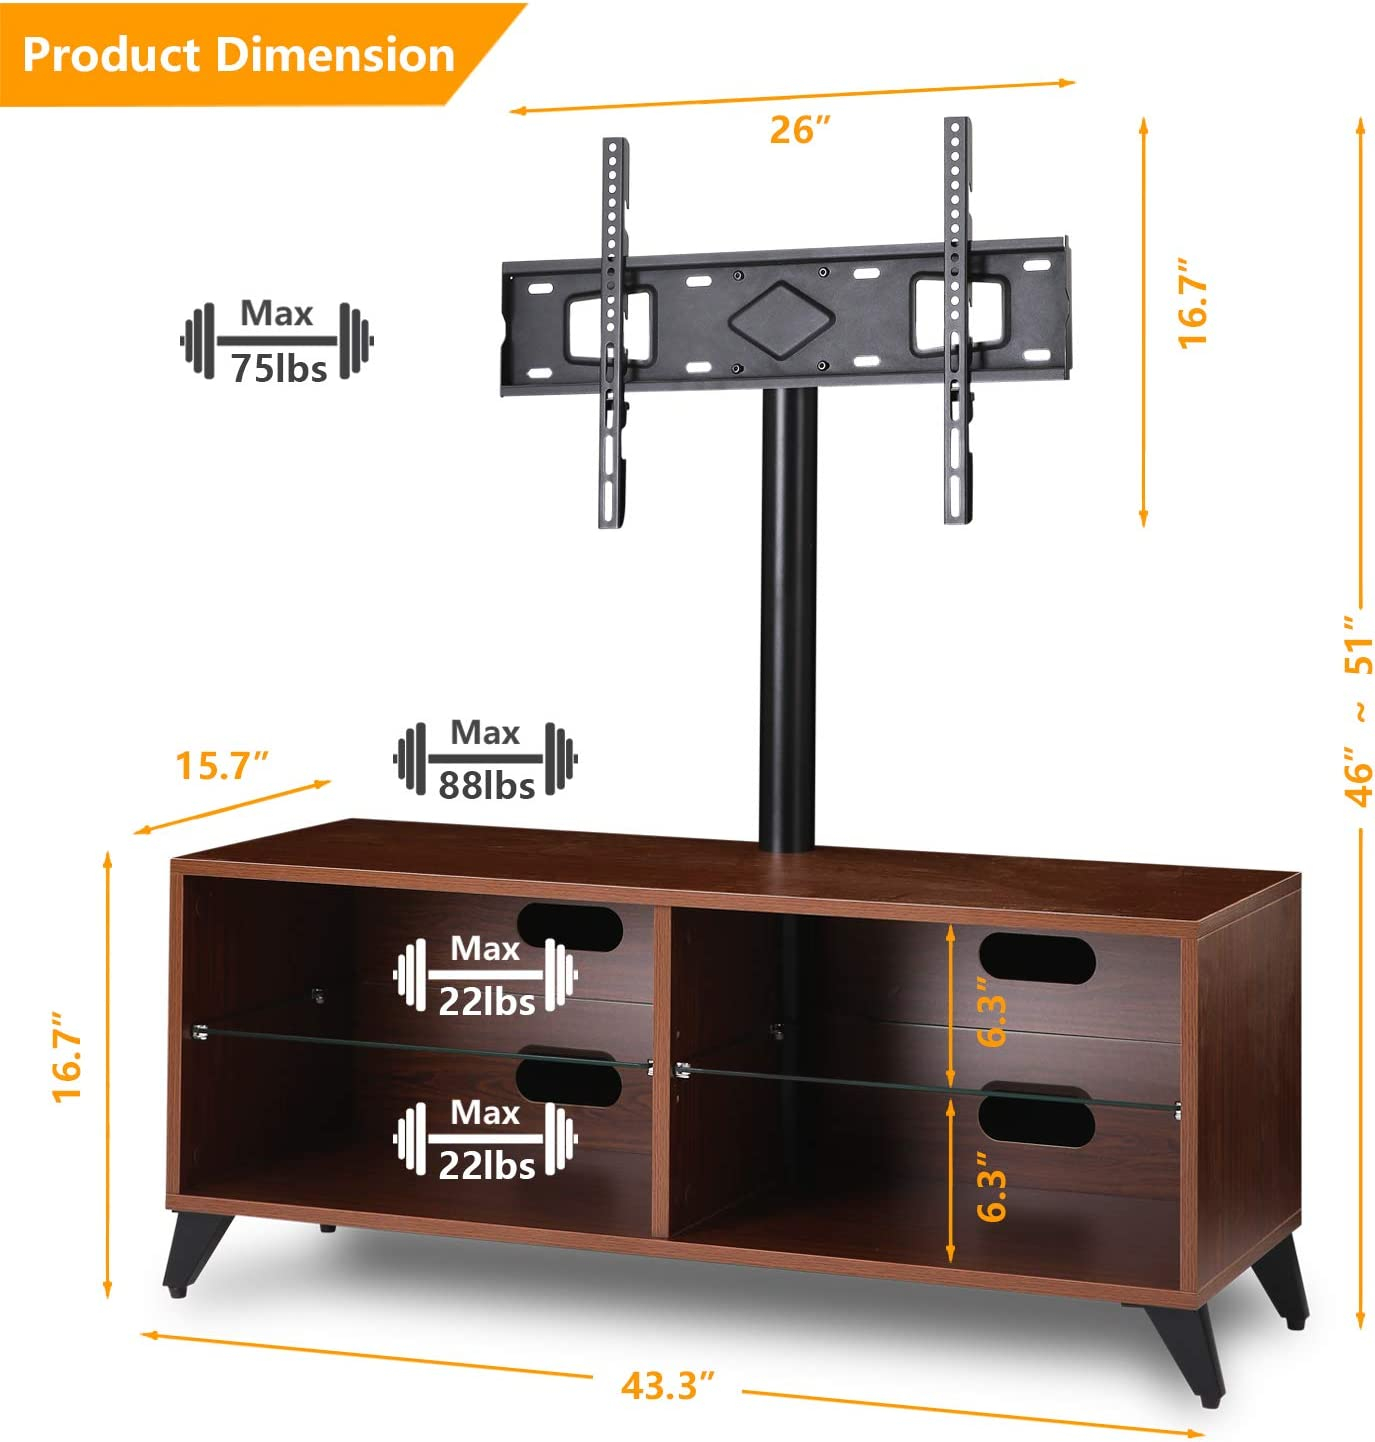 2 Tier Tempered Glass Shelves for Media Storage 5Rcom Corner TV ...